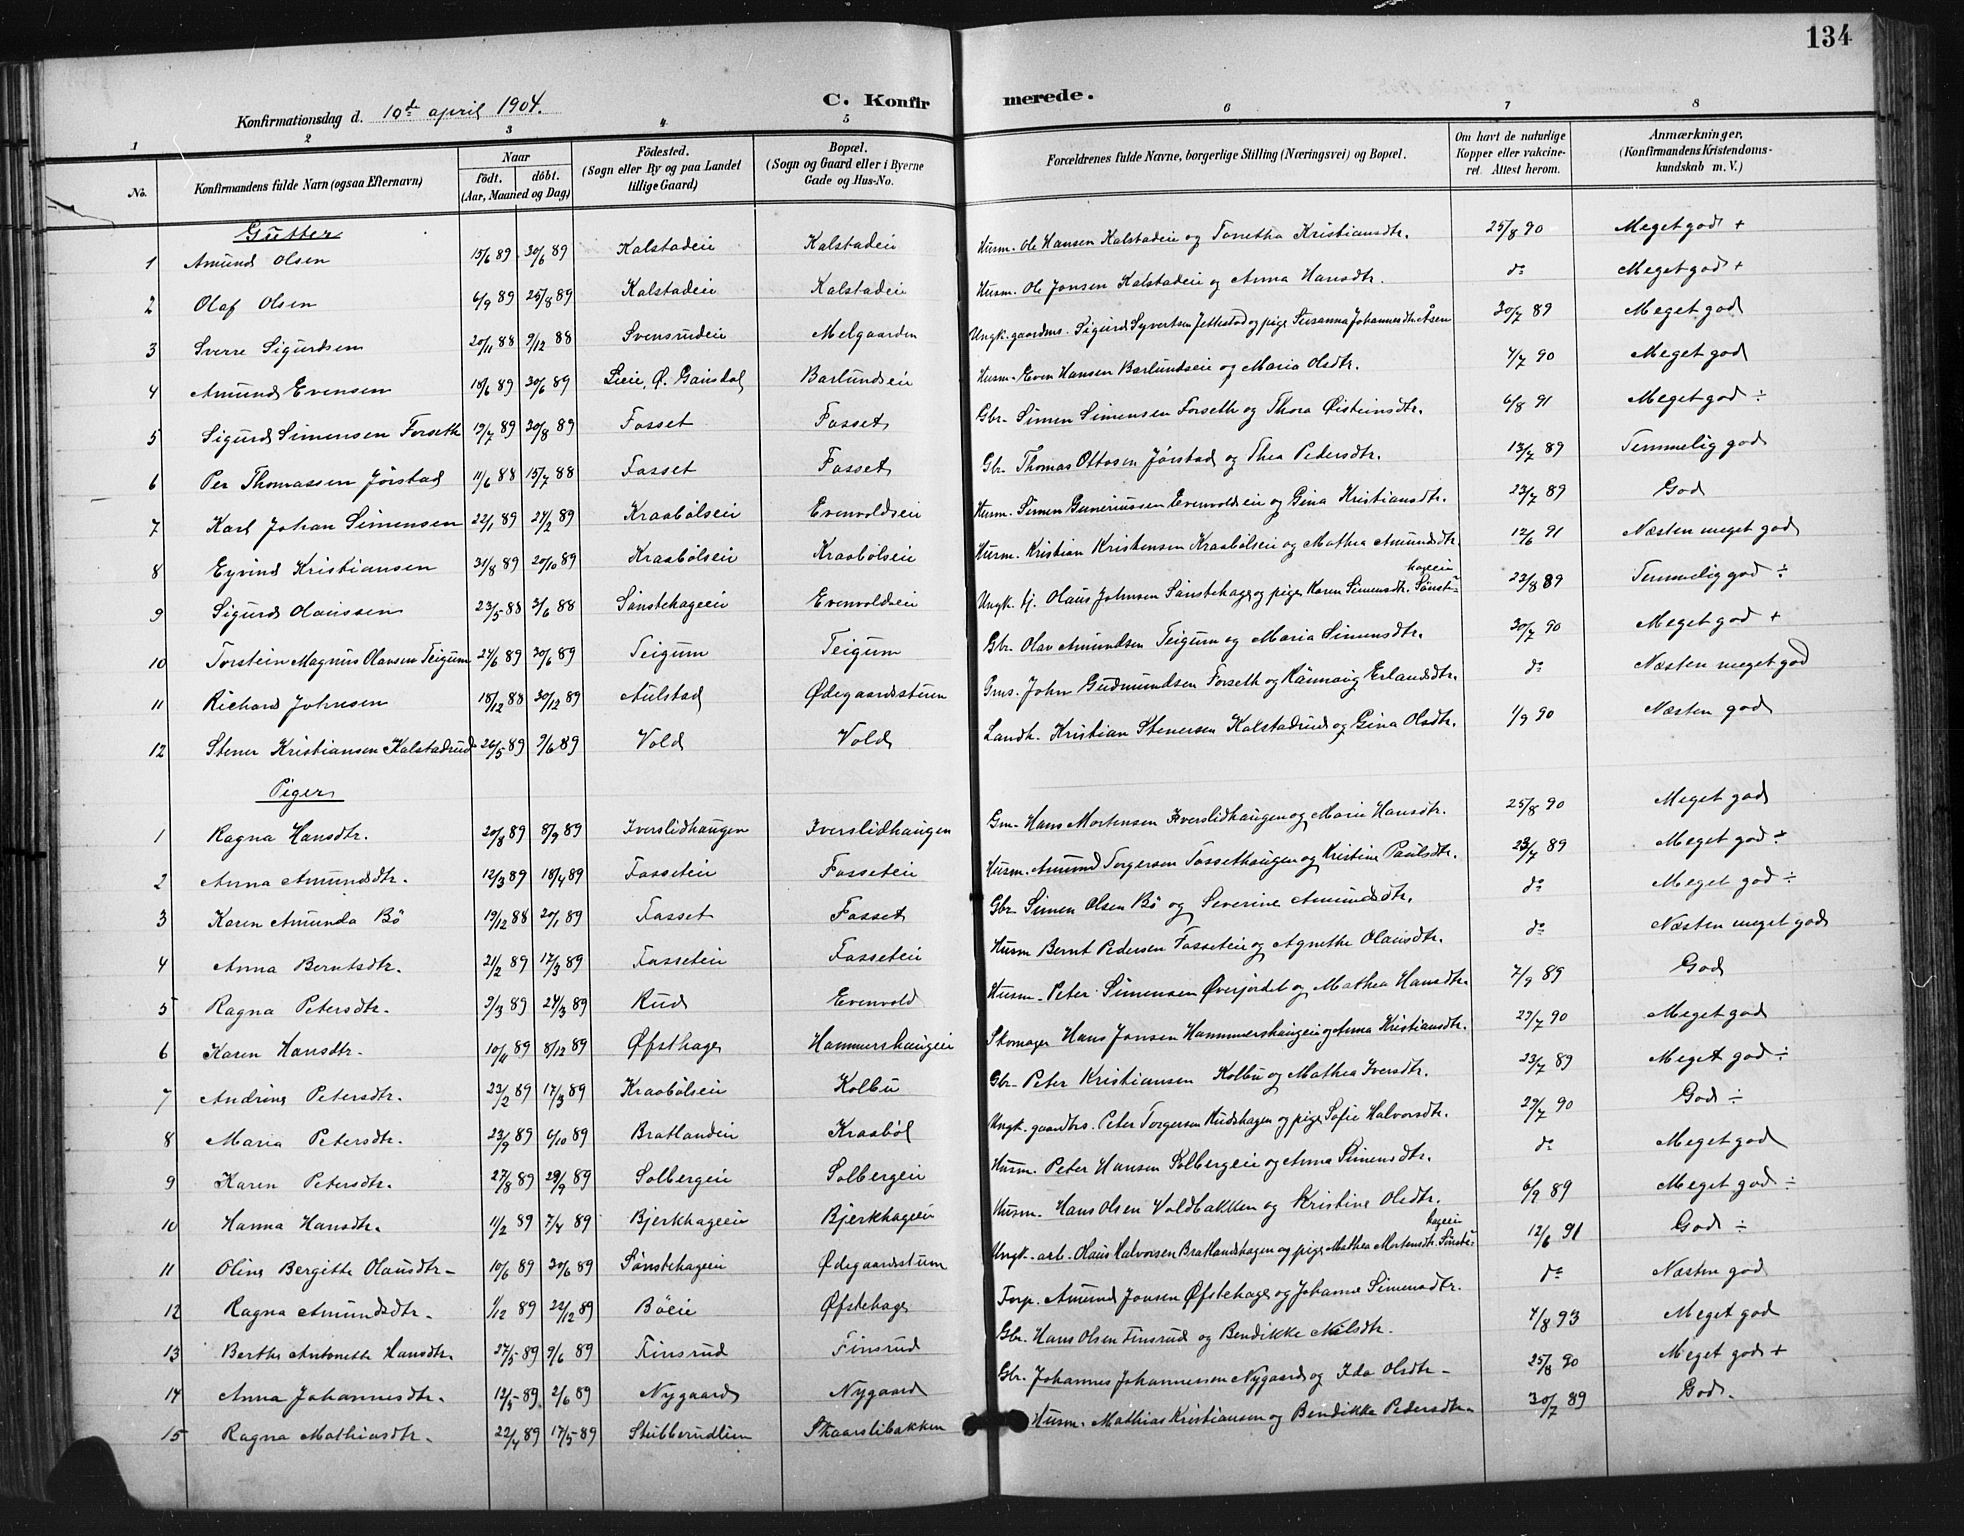 SAH, Vestre Gausdal prestekontor, Klokkerbok nr. 3, 1896-1925, s. 134